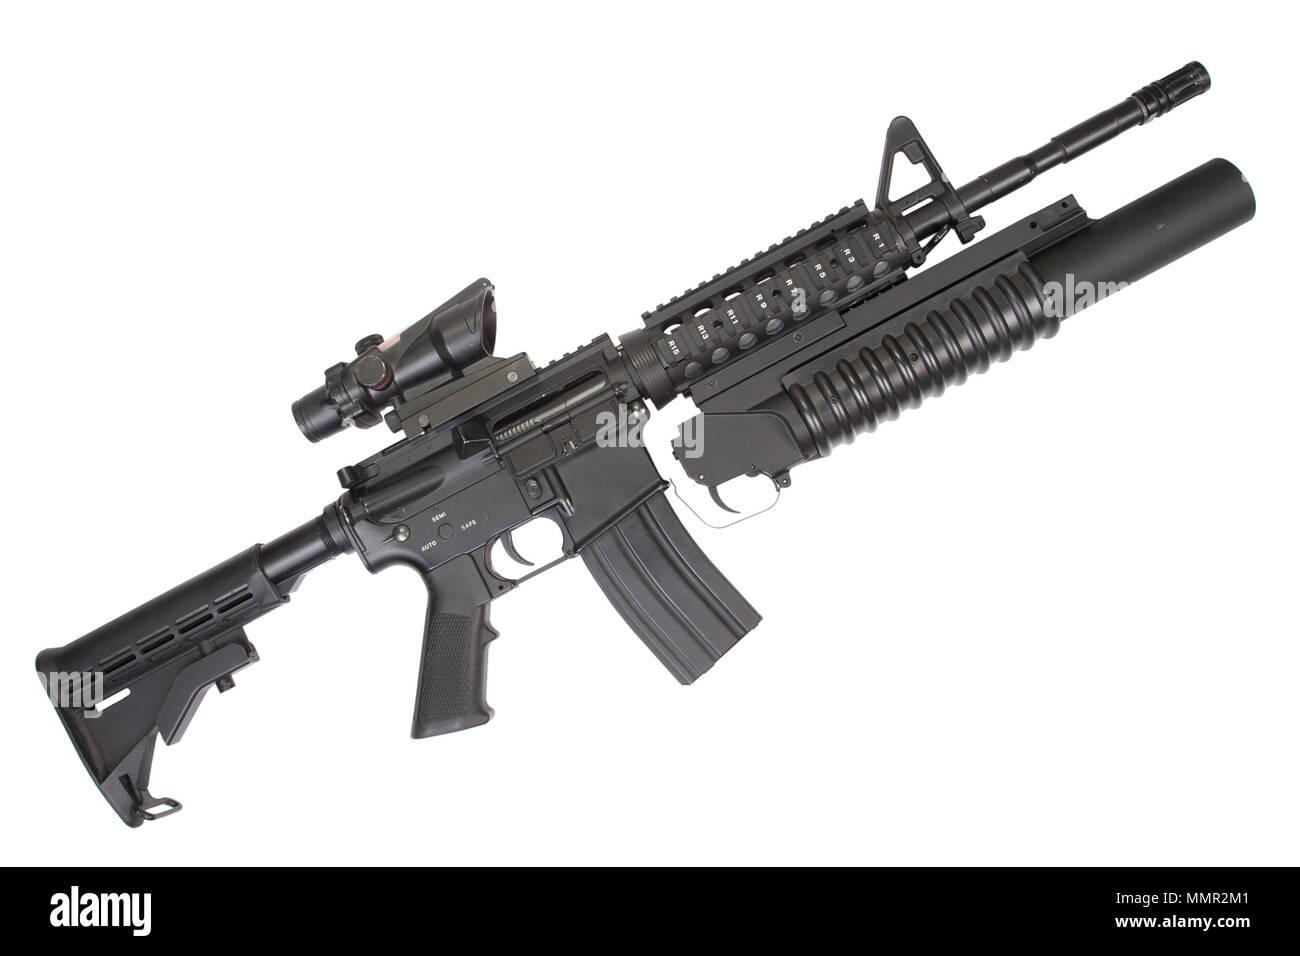 M4 Carbine M4a1 Carbine Stock Photos & M4 Carbine M4a1